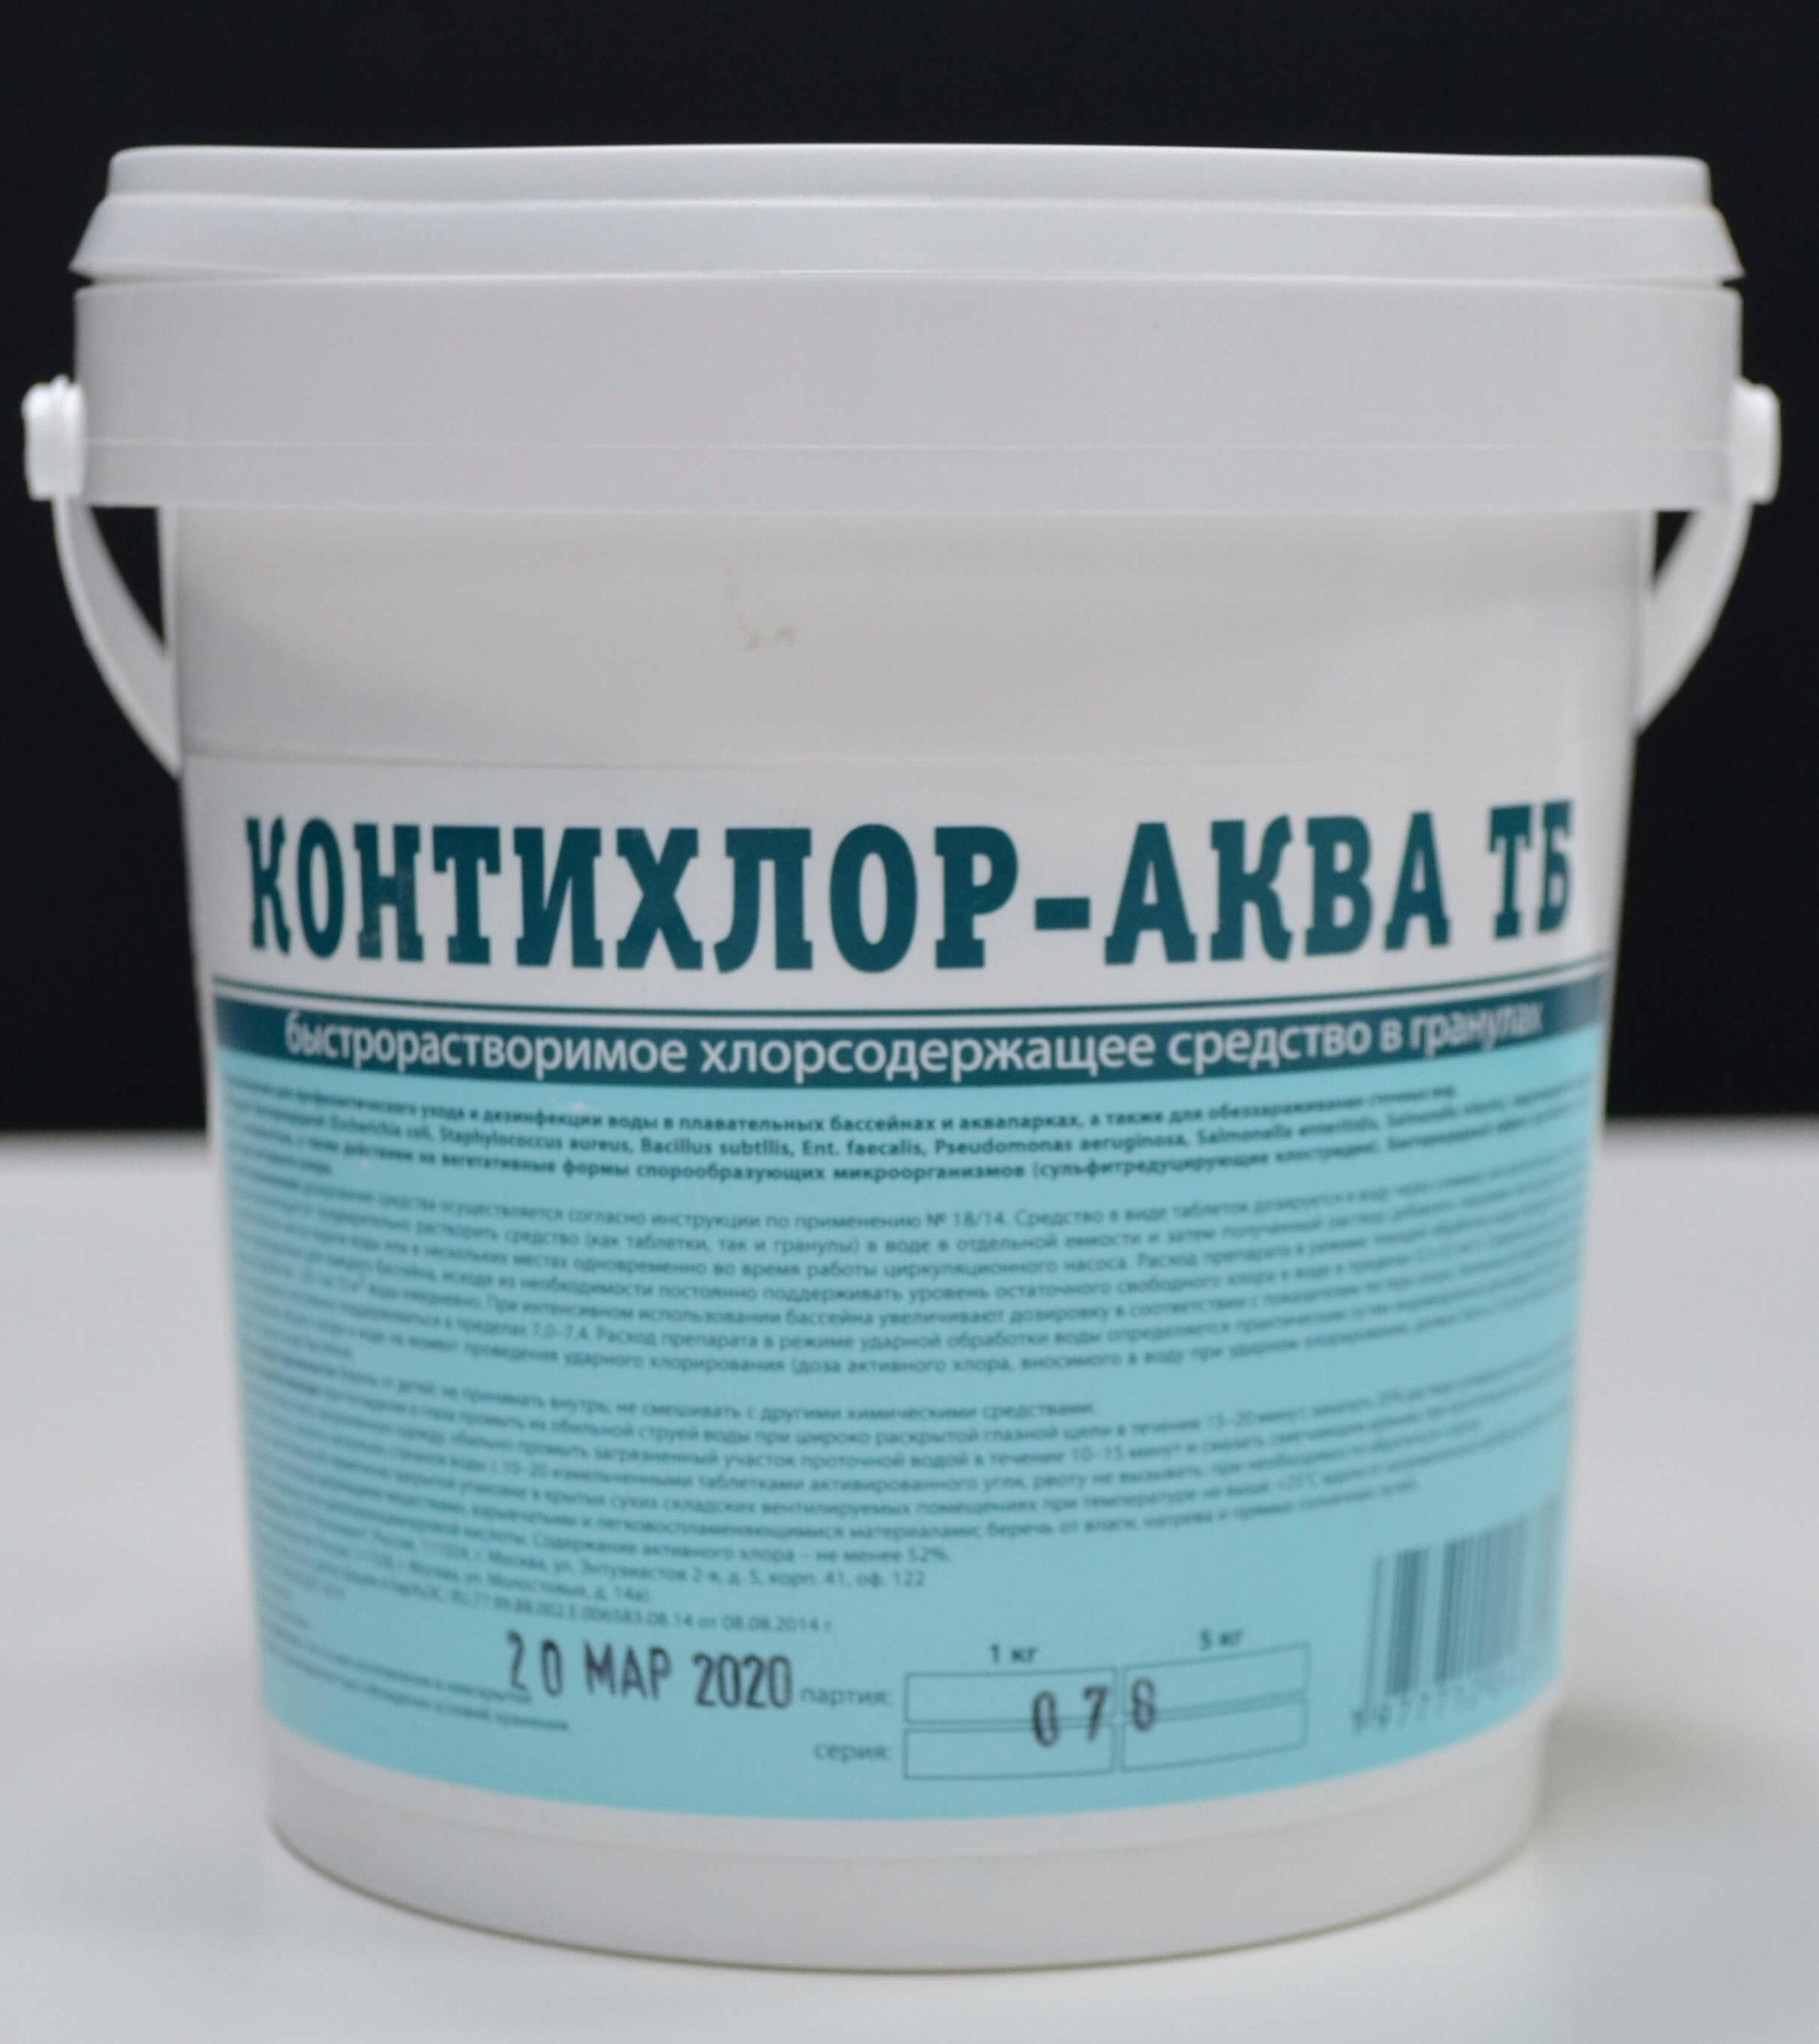 КОНТИХЛОР-АКВА ТБ - (1 кг) Шок-хлор в гранулах